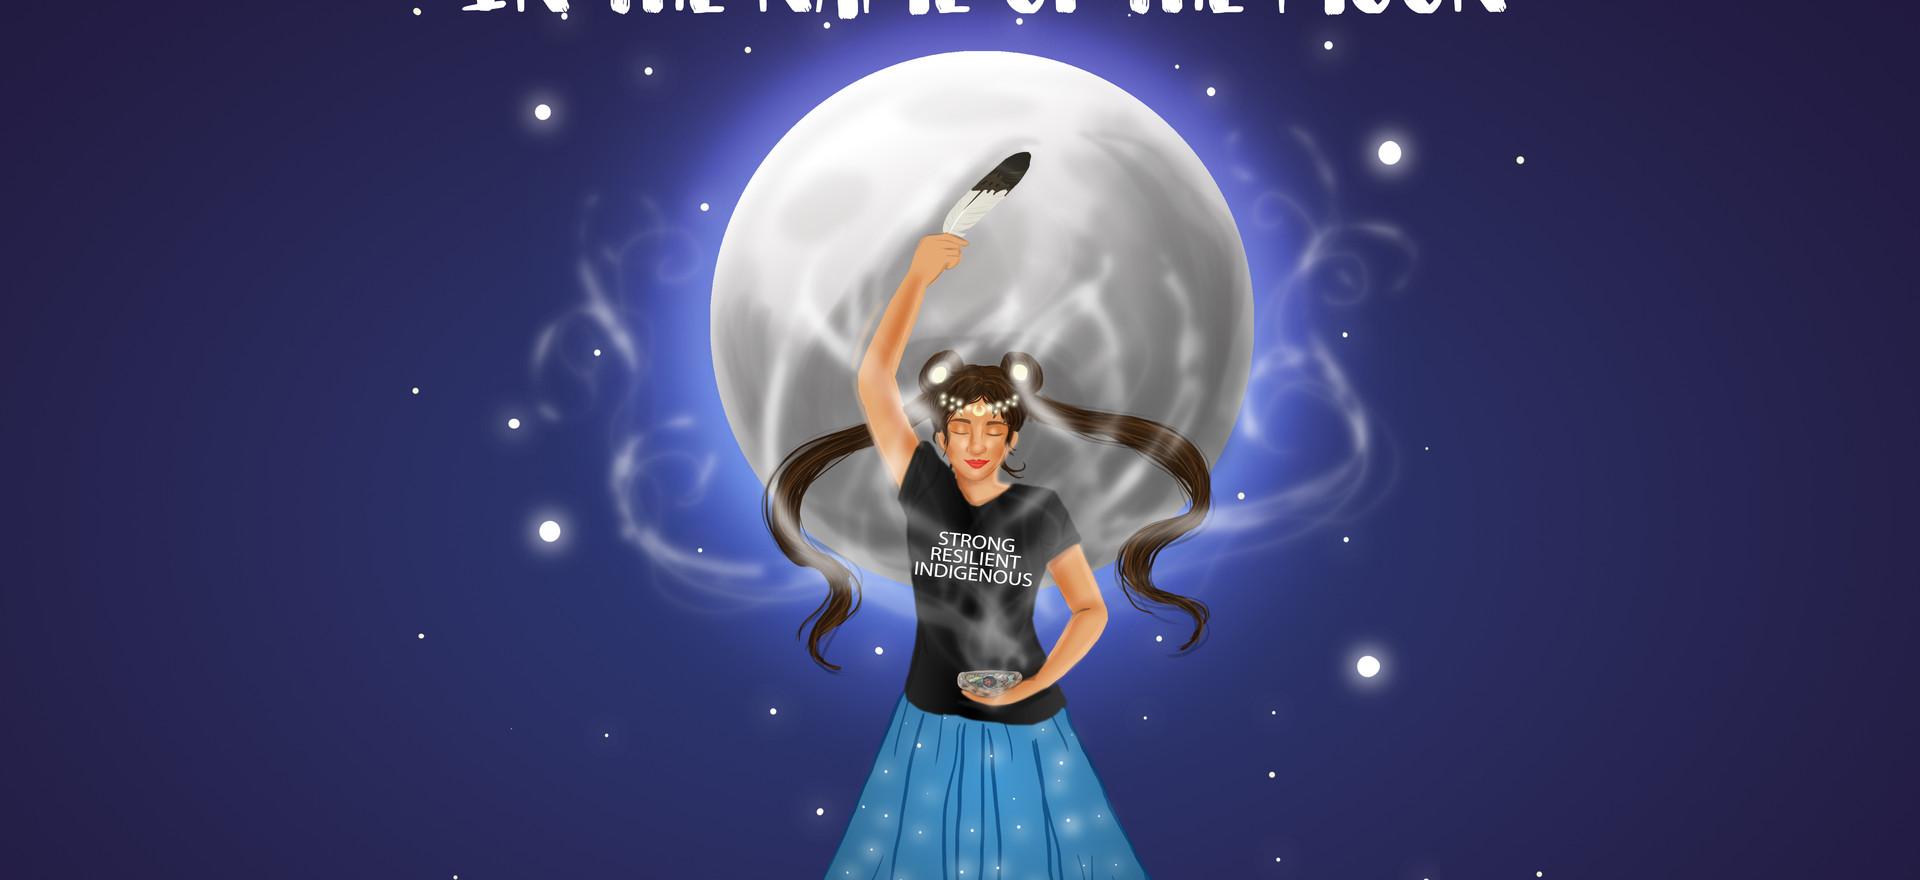 moon-warrior-shirt.jpg